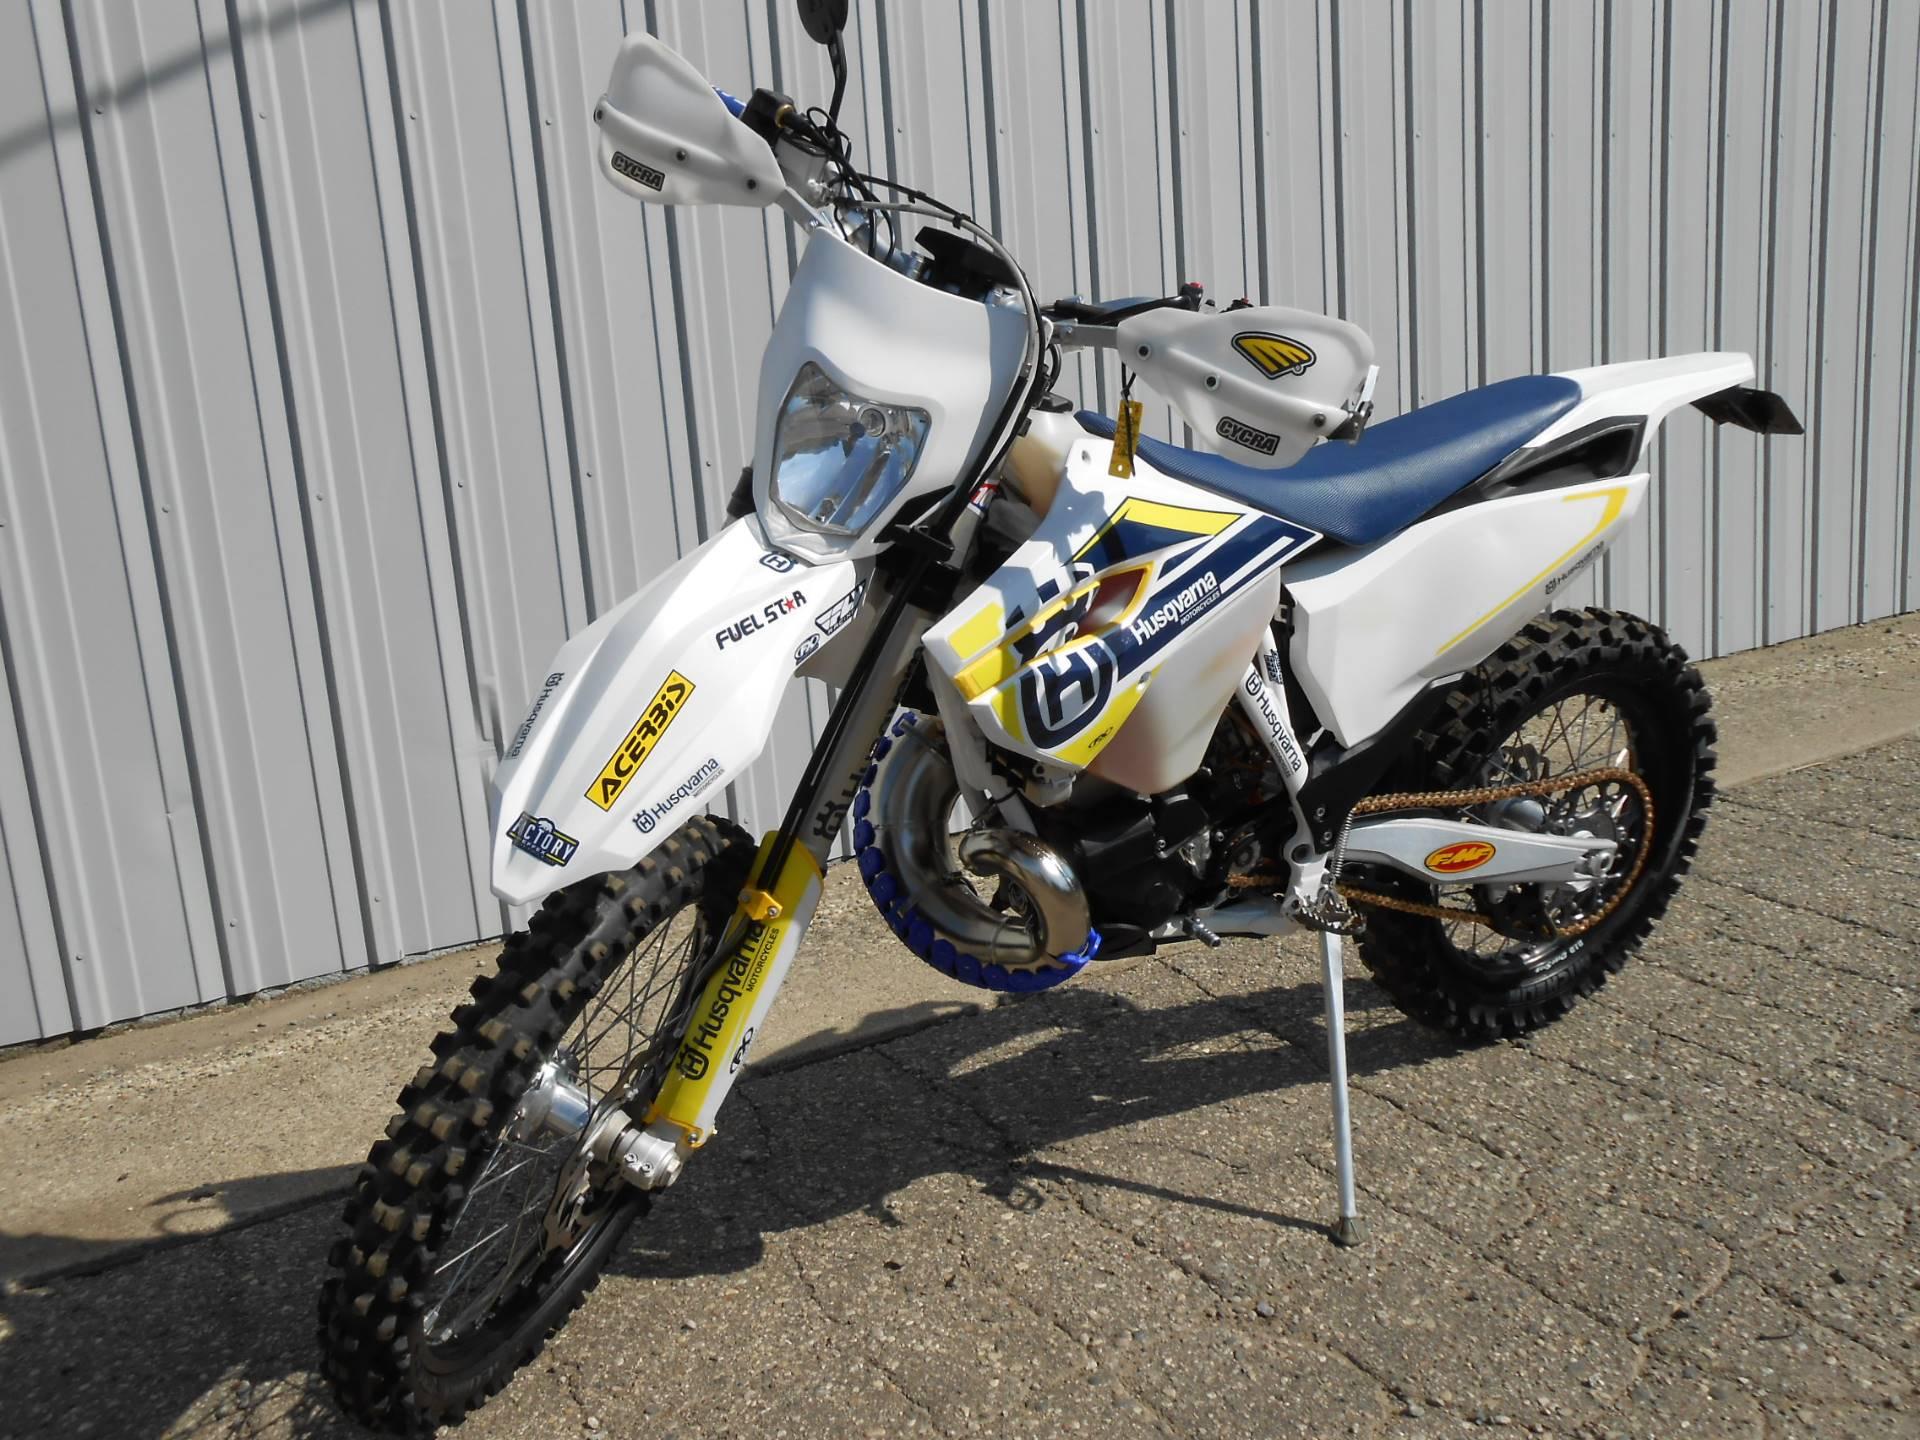 2015 TE 250